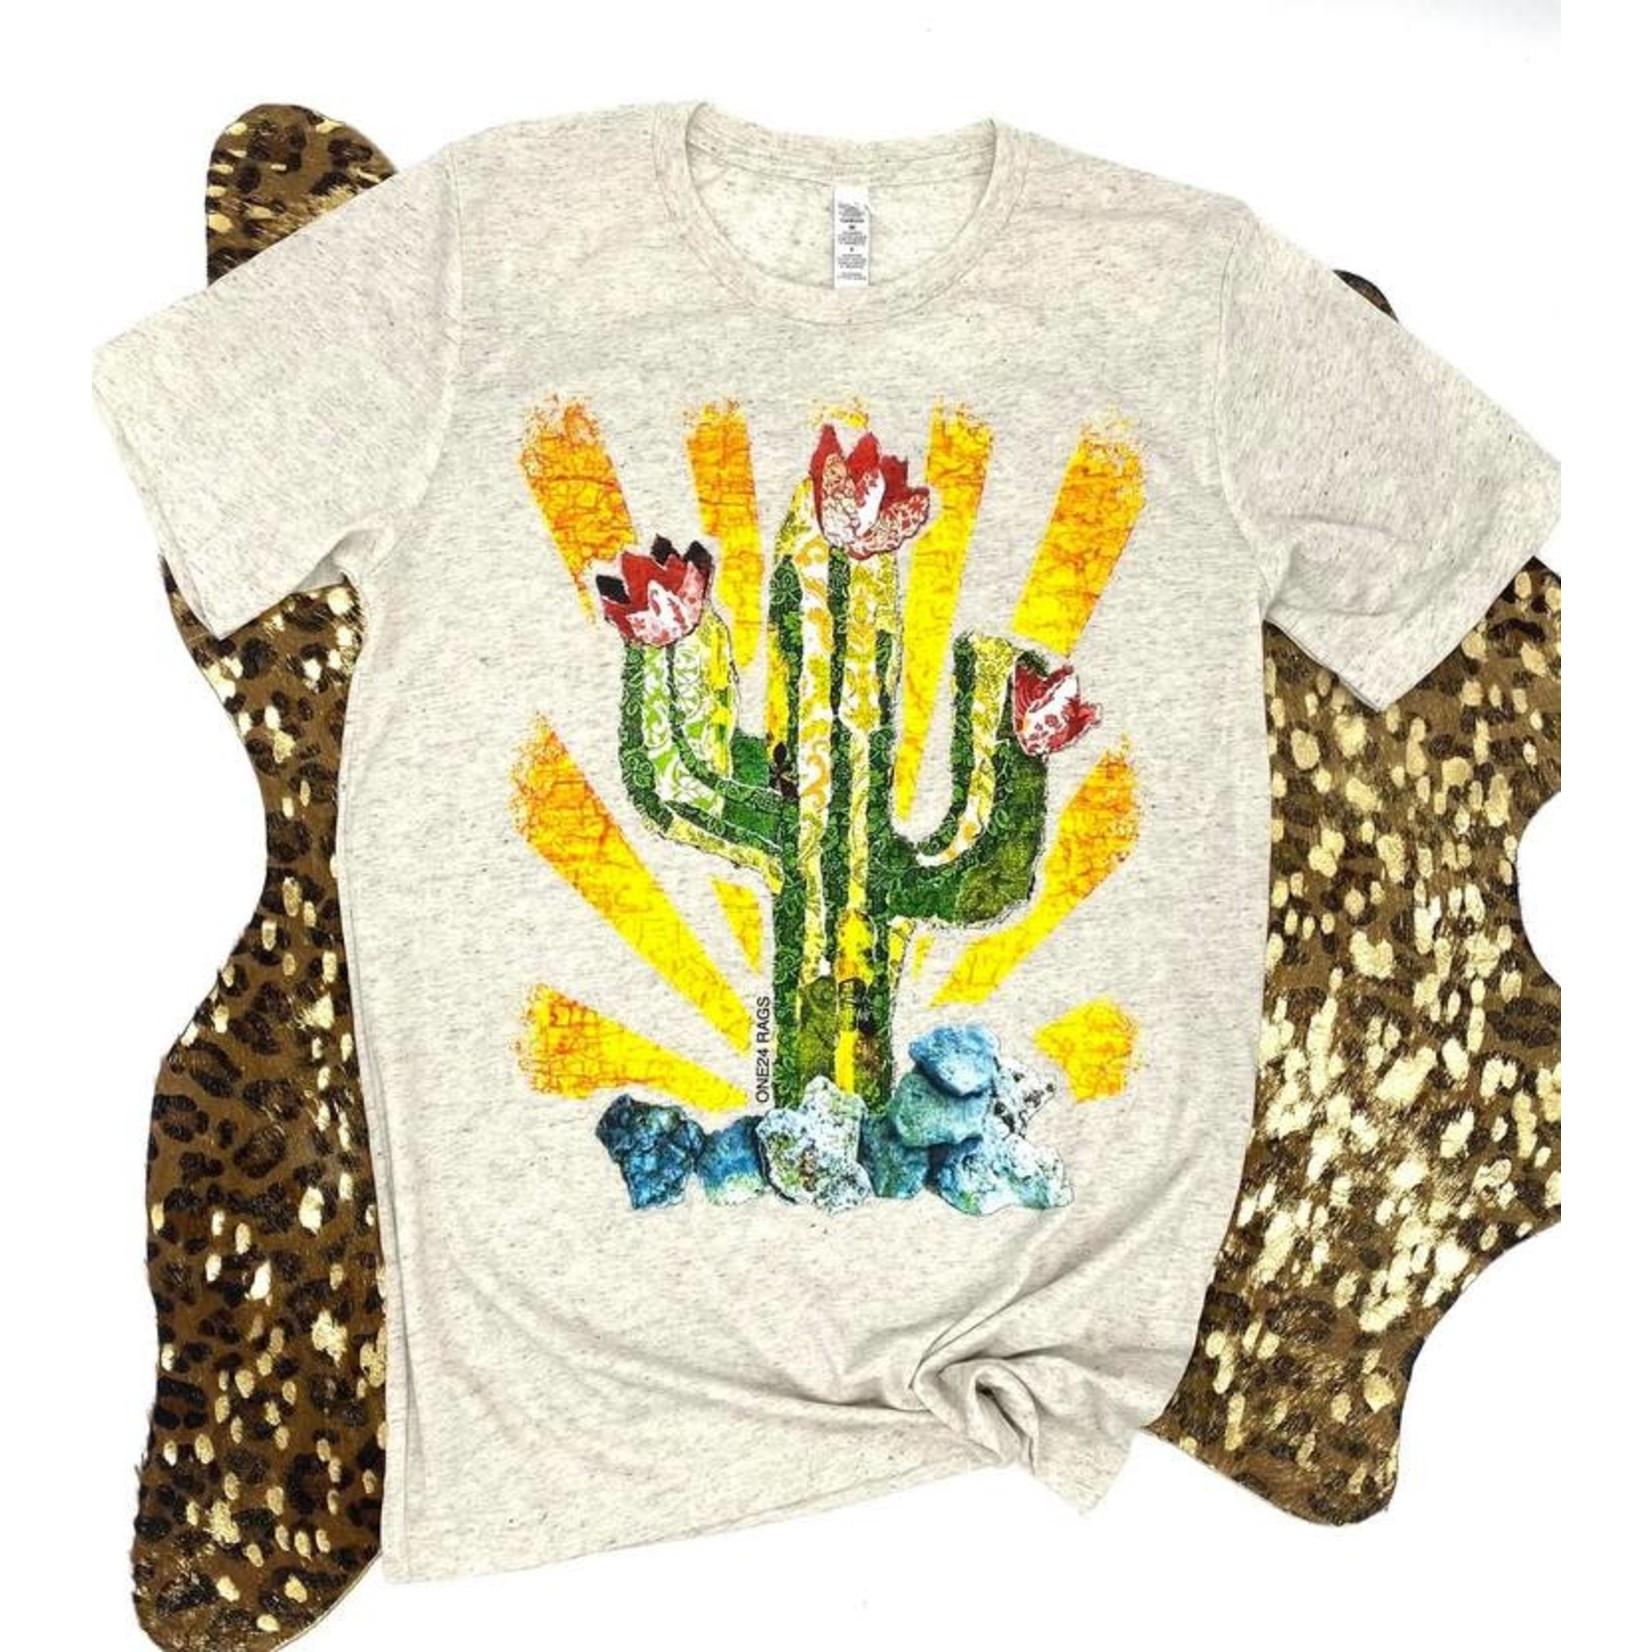 Paper Mache Cactus Tee